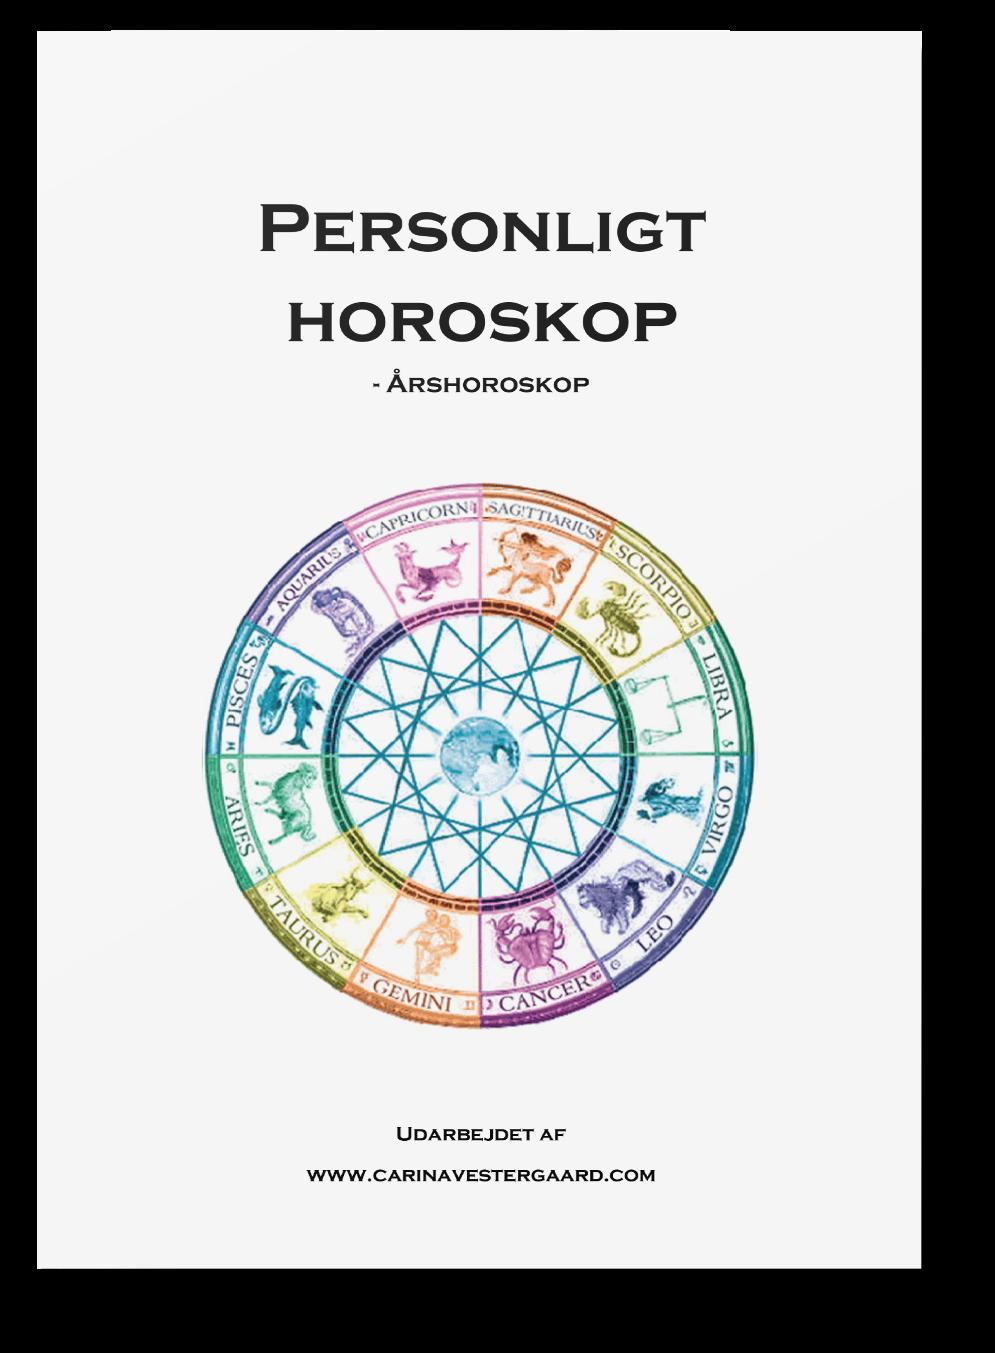 personligt horoskop, Personligt horoskop